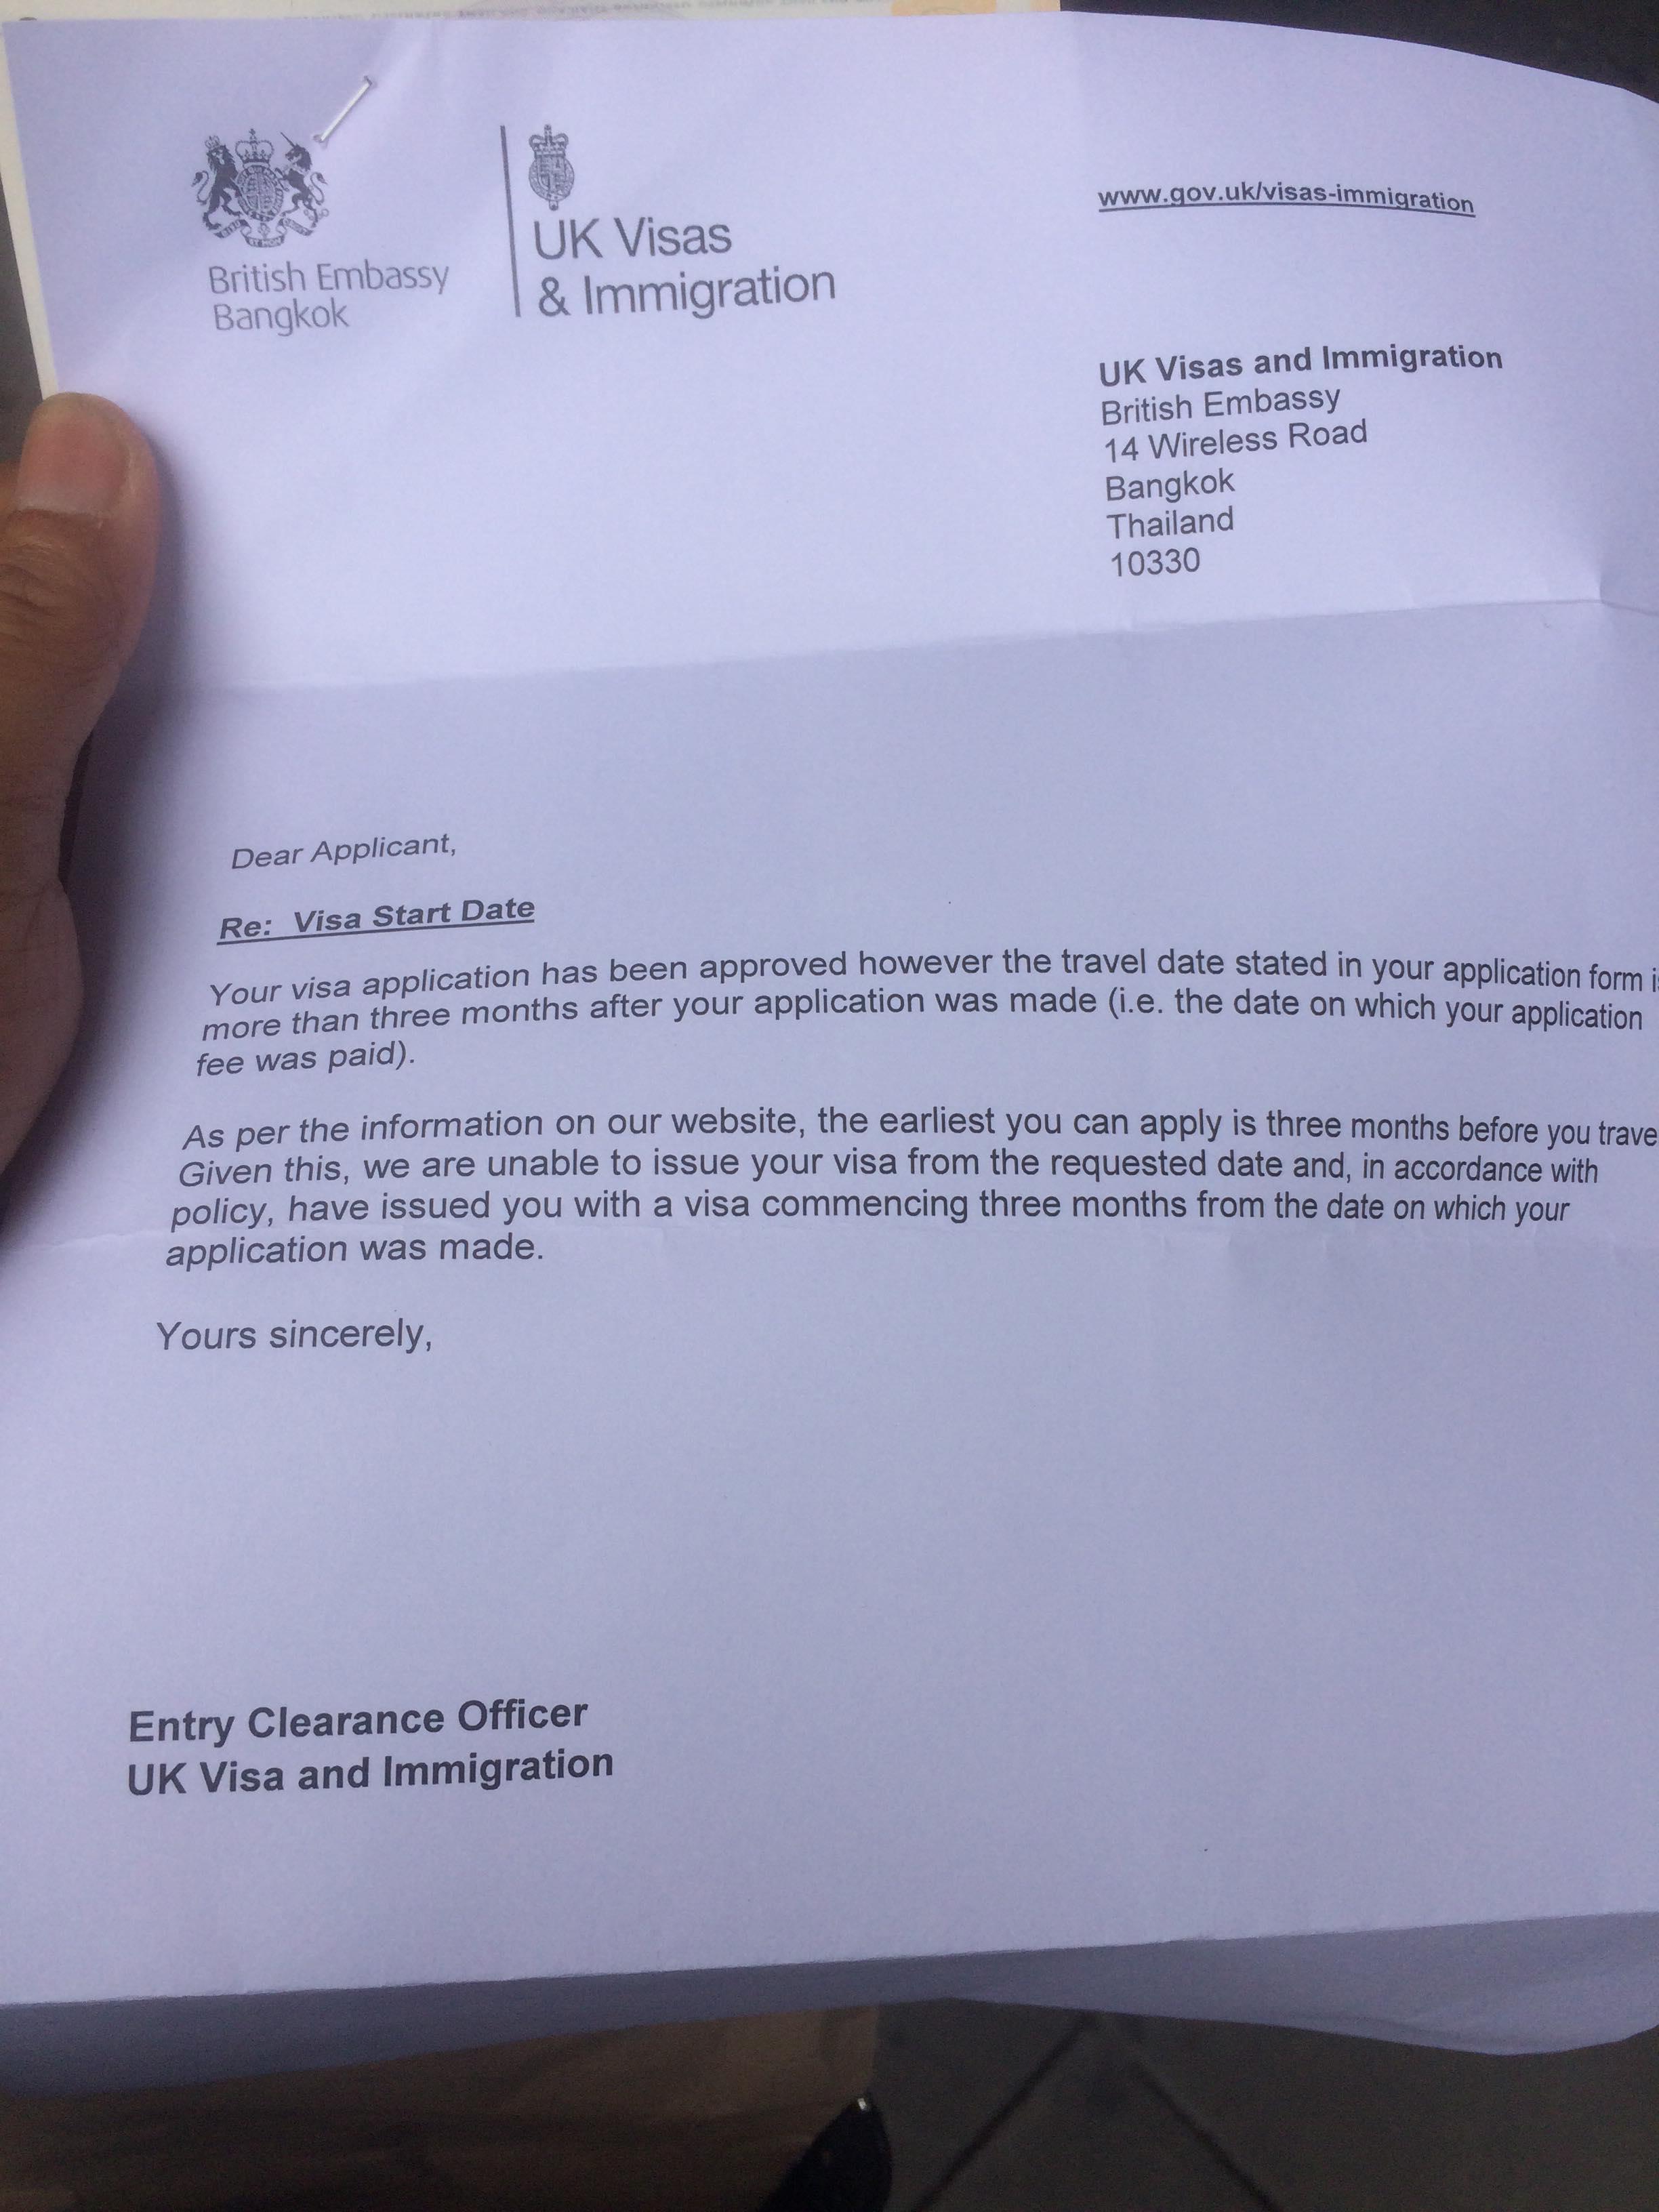 Error on UK visit visa - ignore or take back? - Page 2 - Visas and